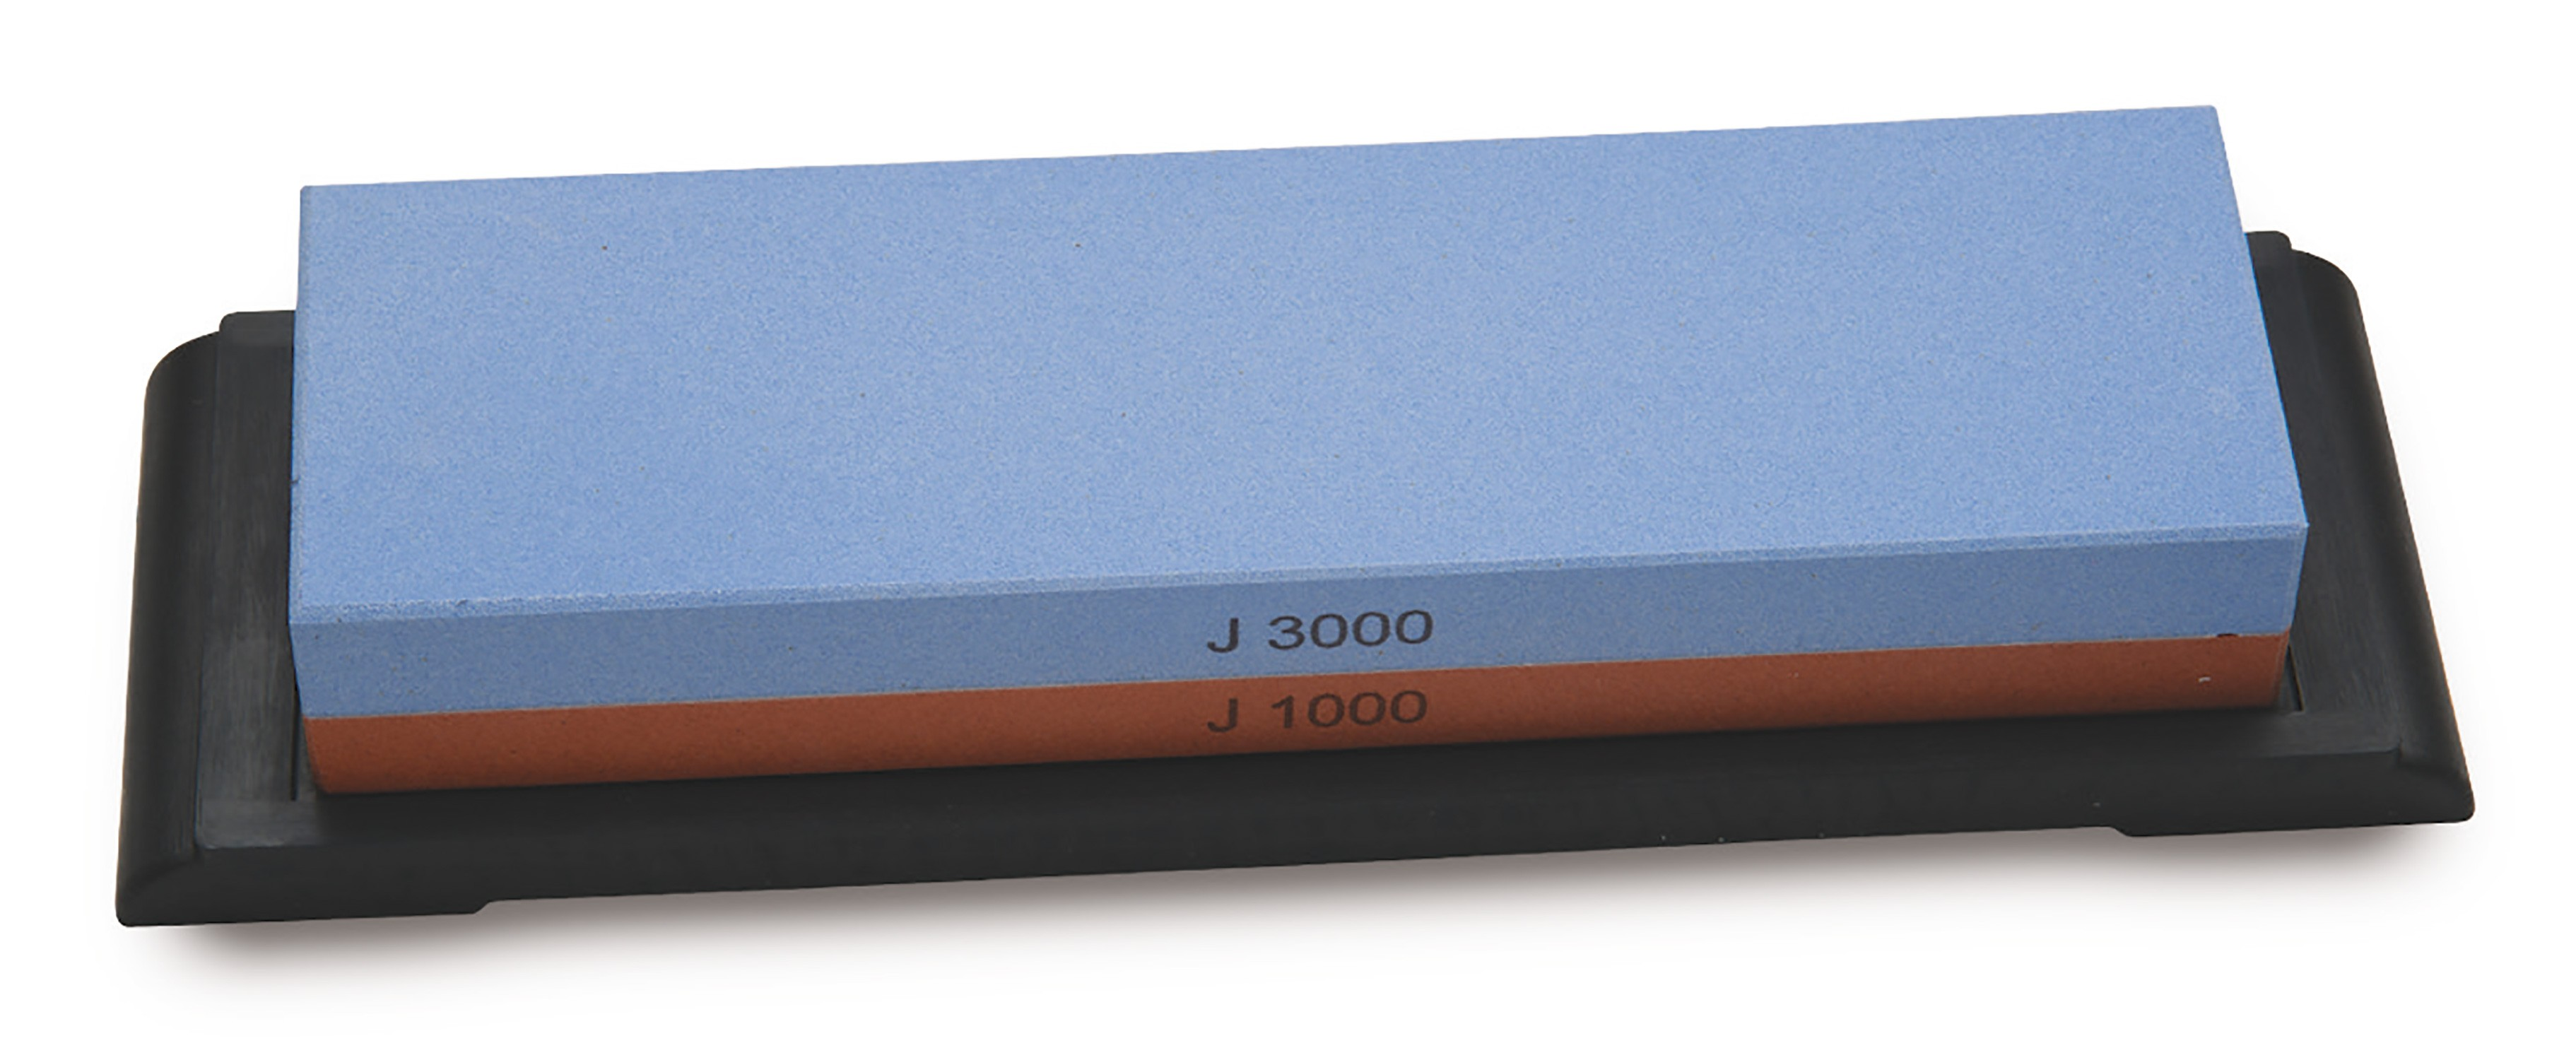 Wüsthof Abziehstein J 1000 - 3000